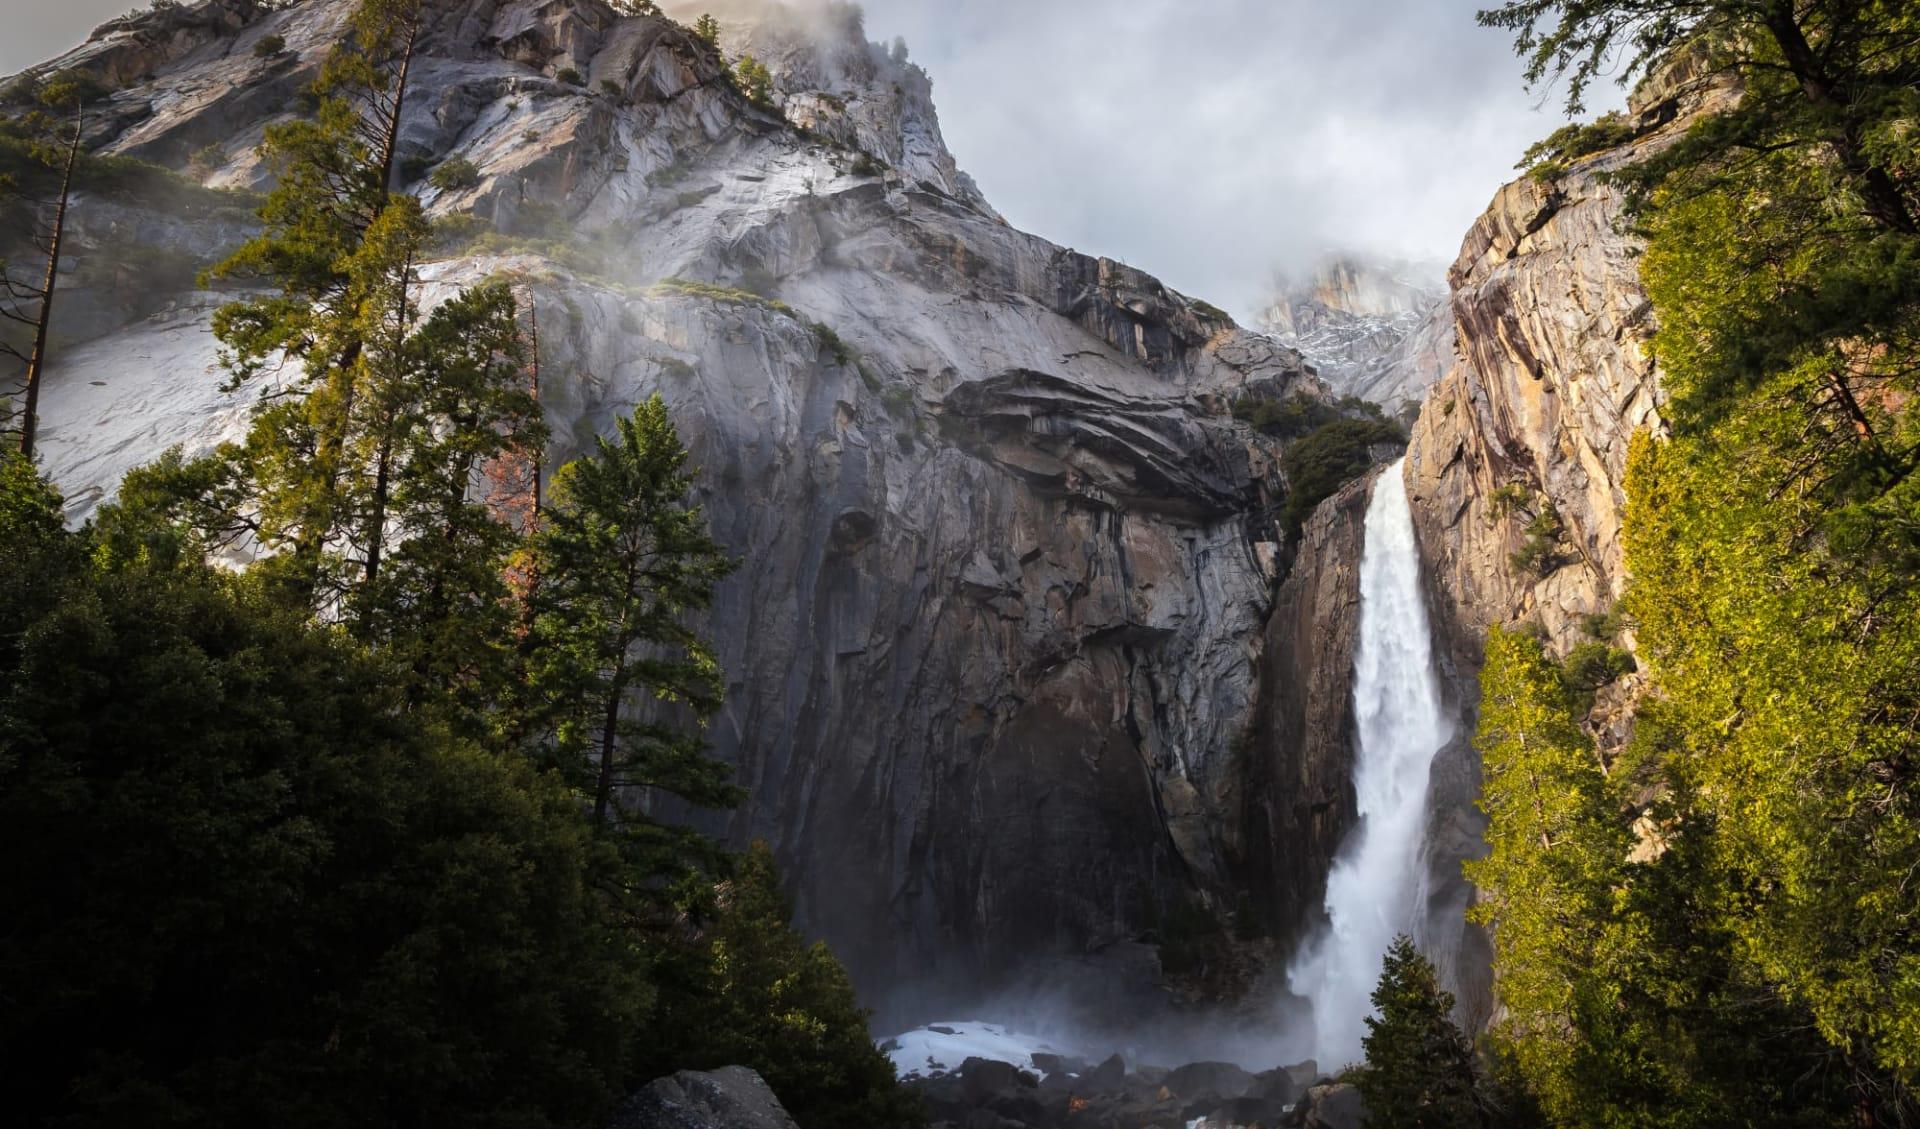 West Coast Insider ab San Francisco: USA - California - Yosemite NP